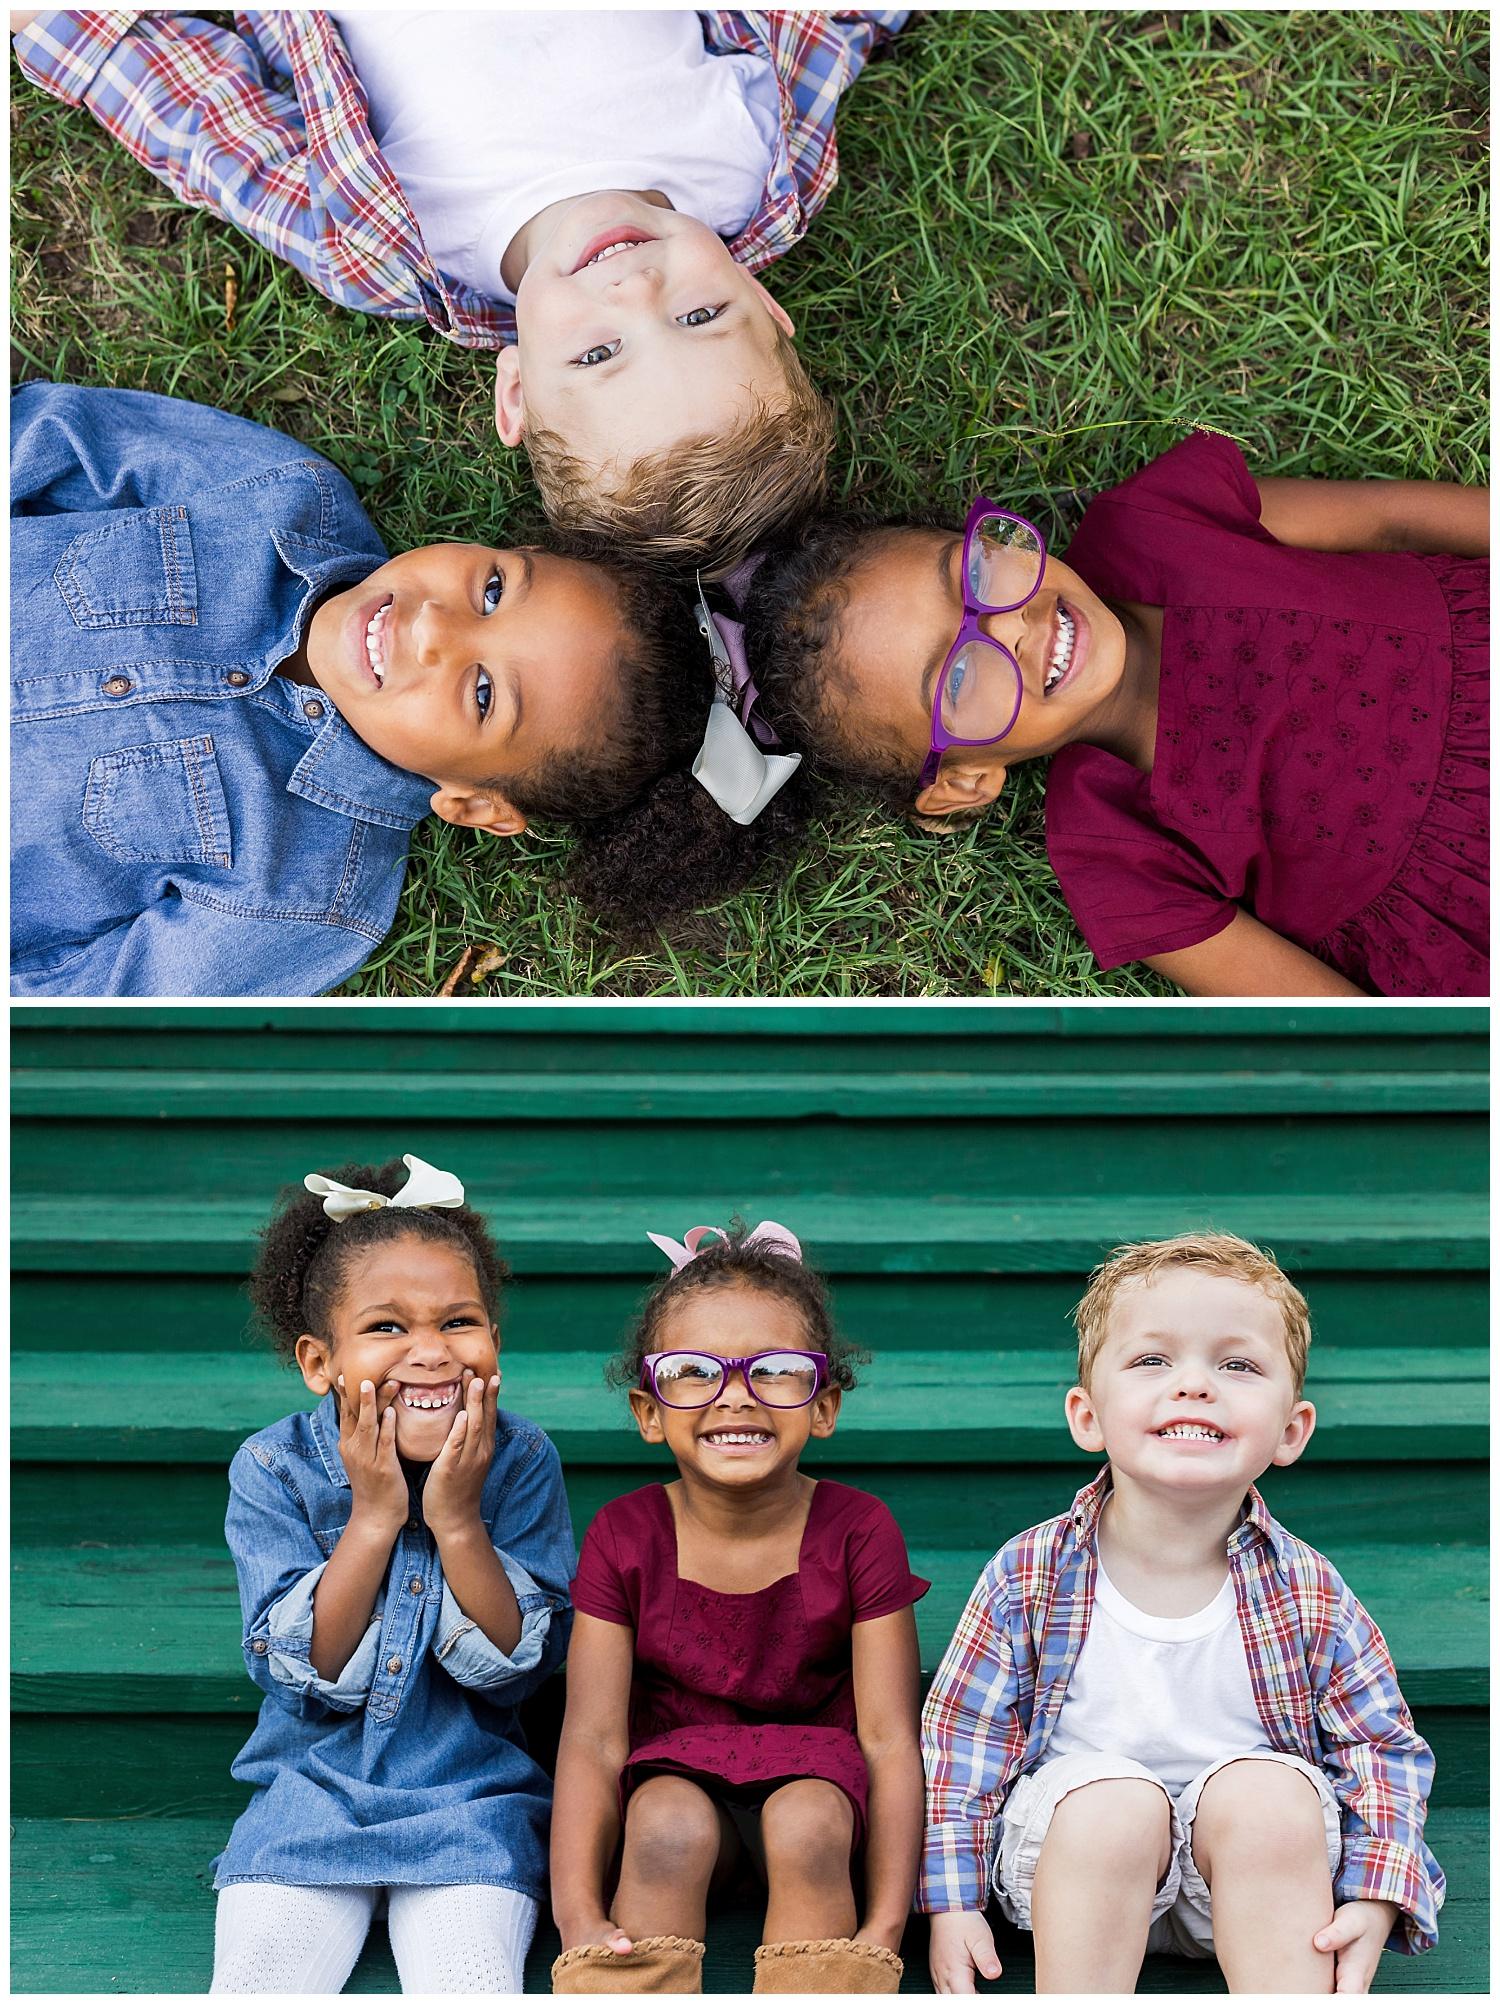 childrens portraits family photos young children auburn alabama kiesel lauren beesley photography